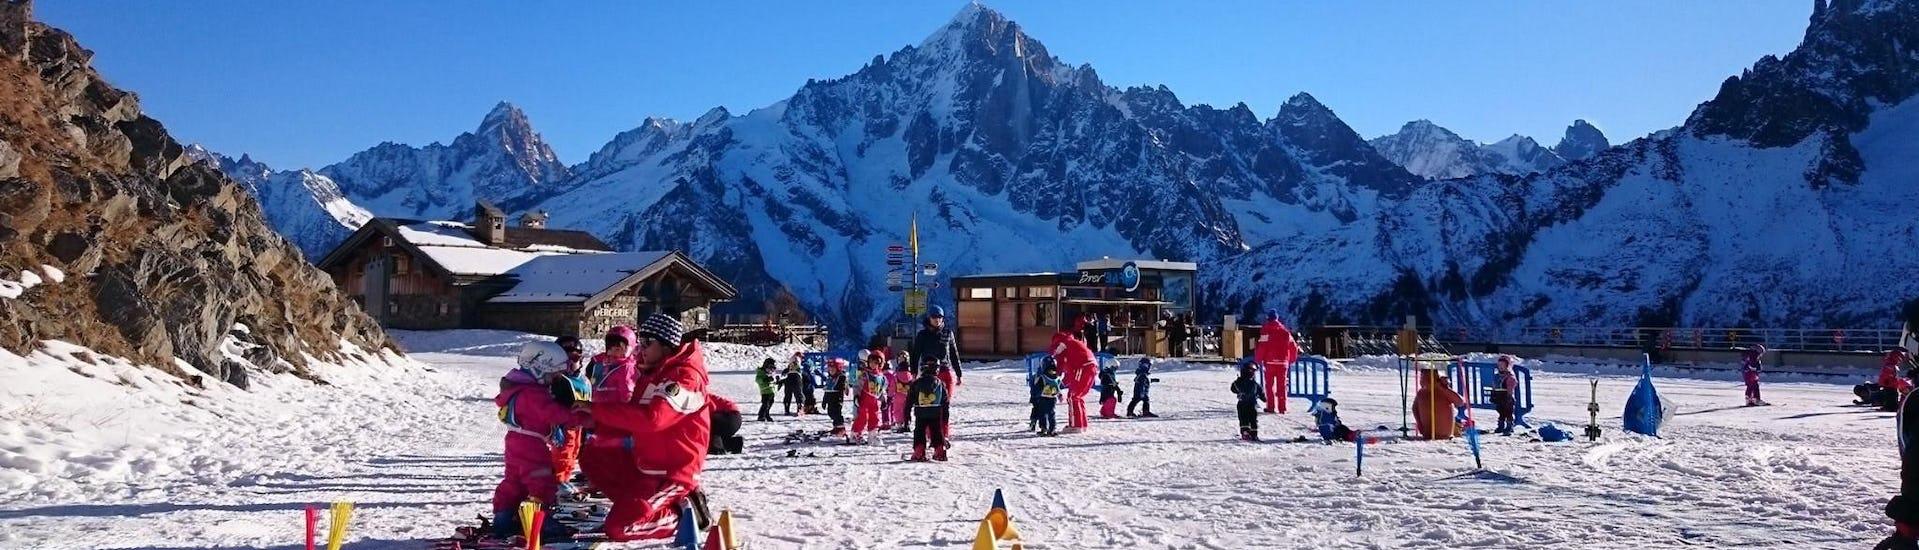 "View of the Club Piou-Piou where young children take their Kids Ski Lessons ""Club Piou-Piou"" (3-4 years) with the ski school ESF Chamonix."